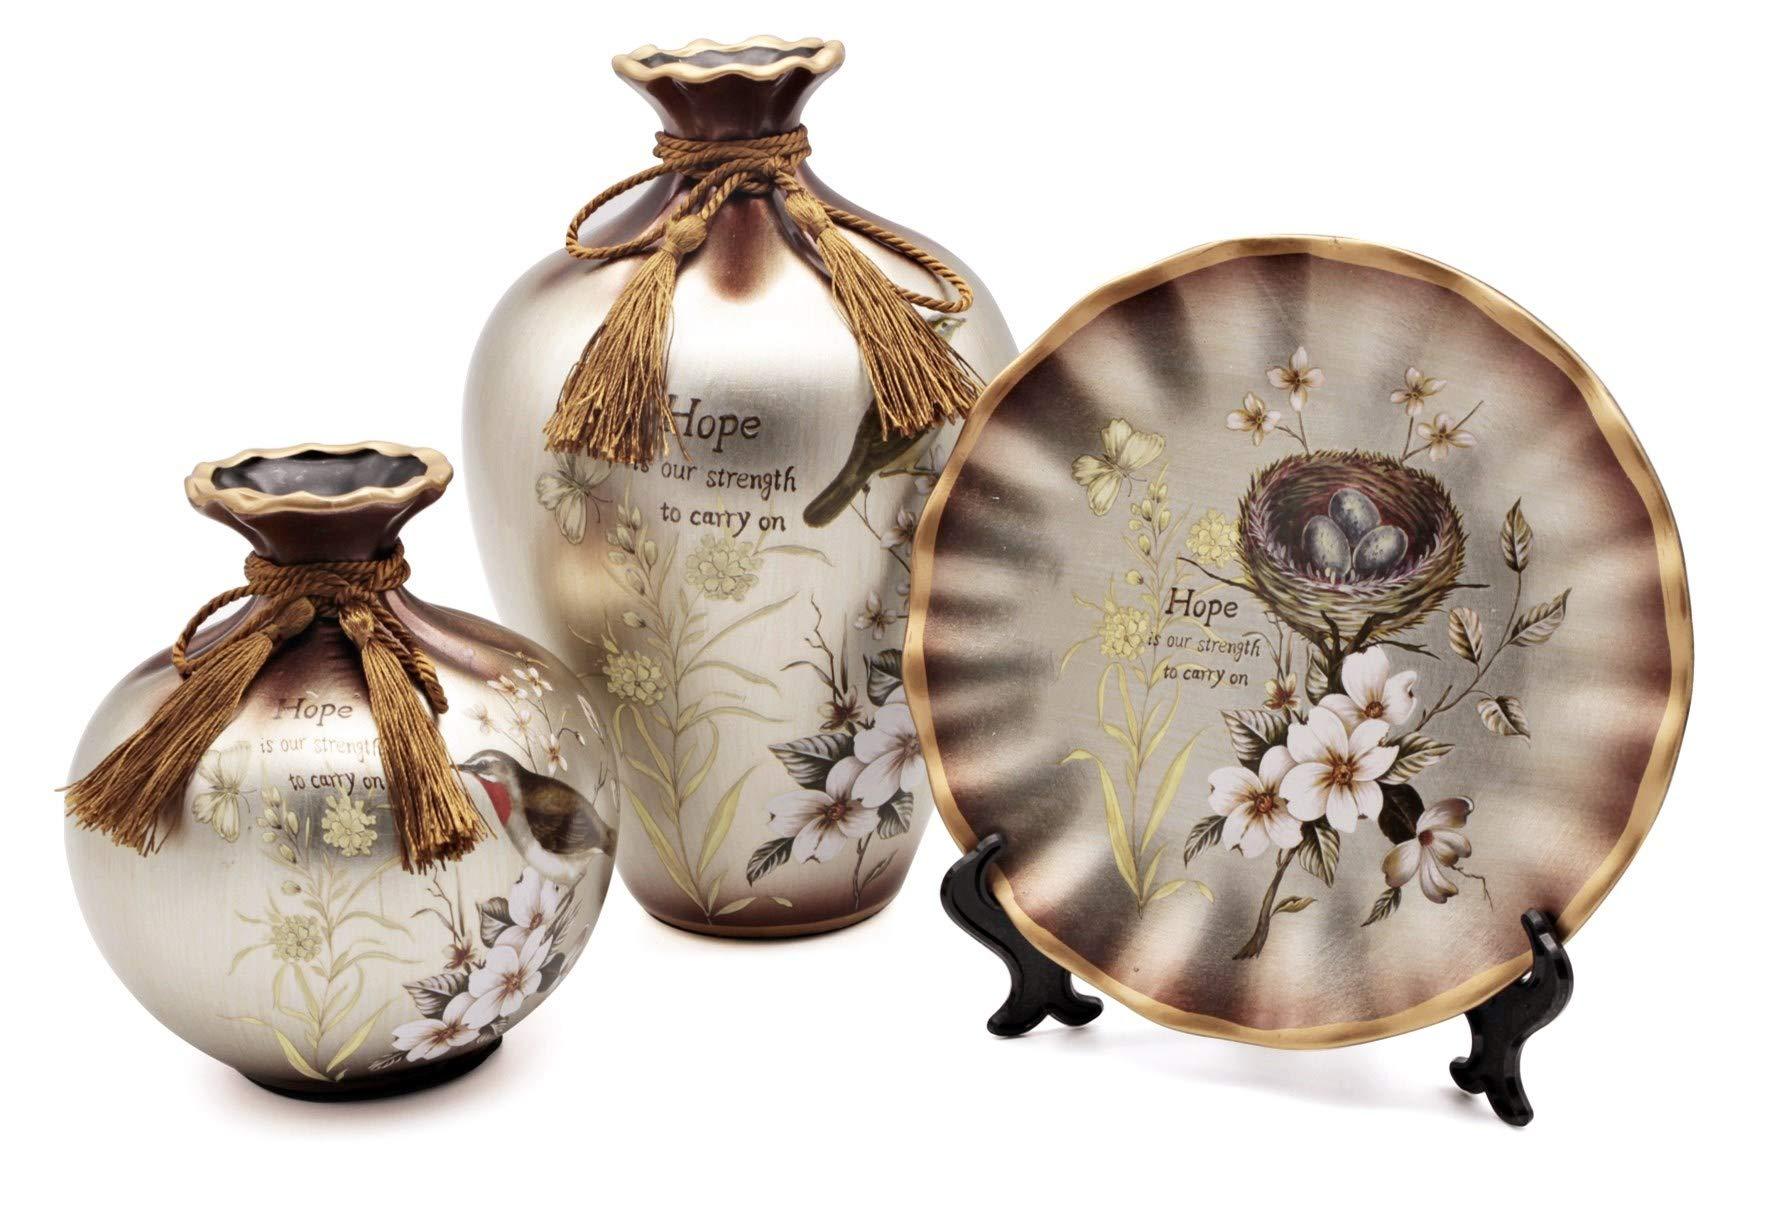 NEWQZ China Vase, Ceramic Vase Set of 3 Pieces, Chinese Porcelain Vases, Color: Silver Ash